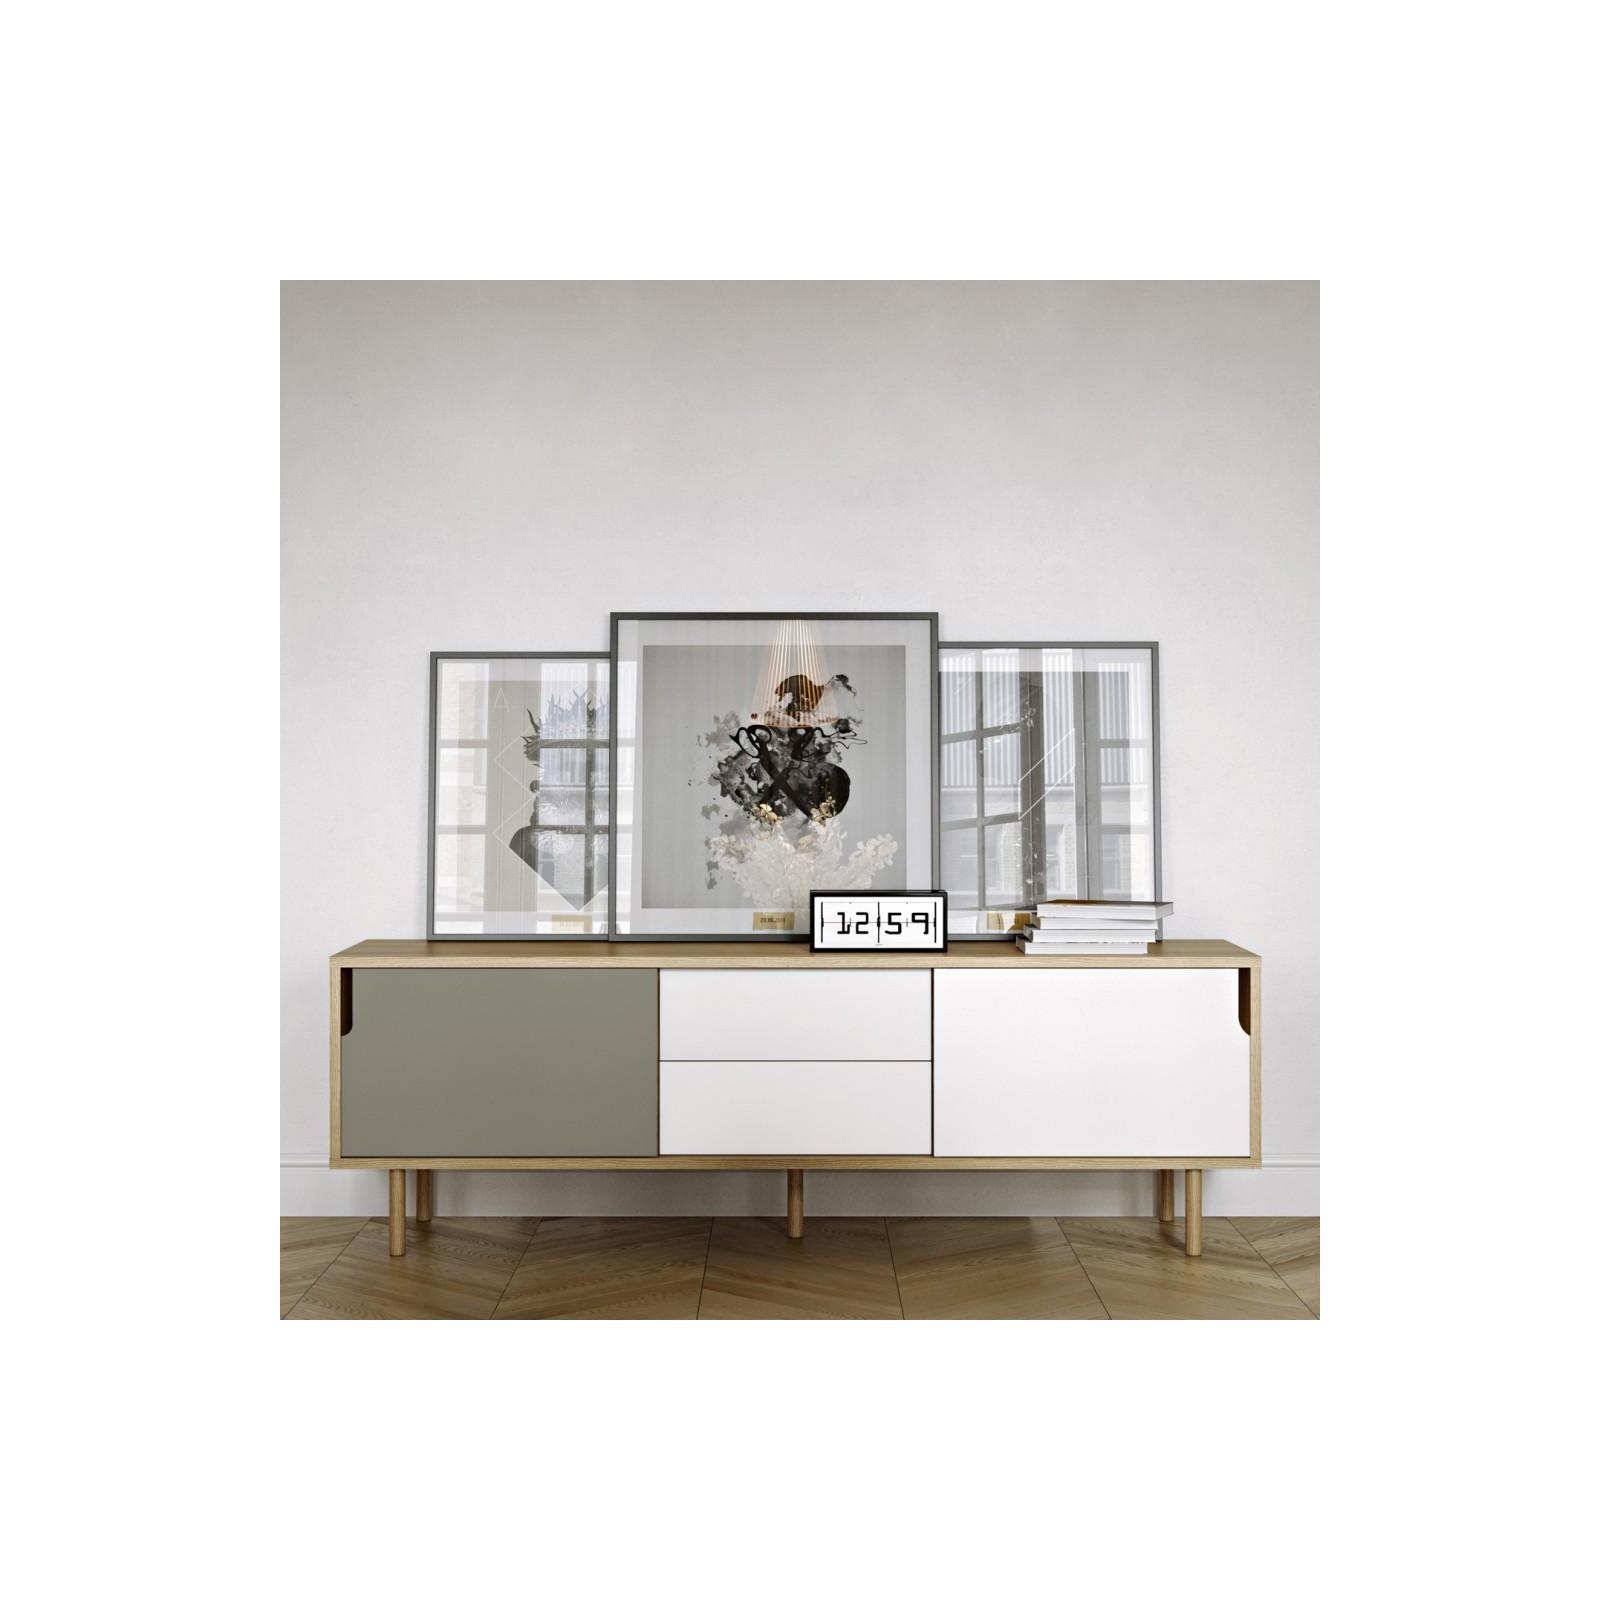 Meuble Tv Danois Gris Blanc Et Bois Arne Concept # Meuble Tele Blanc